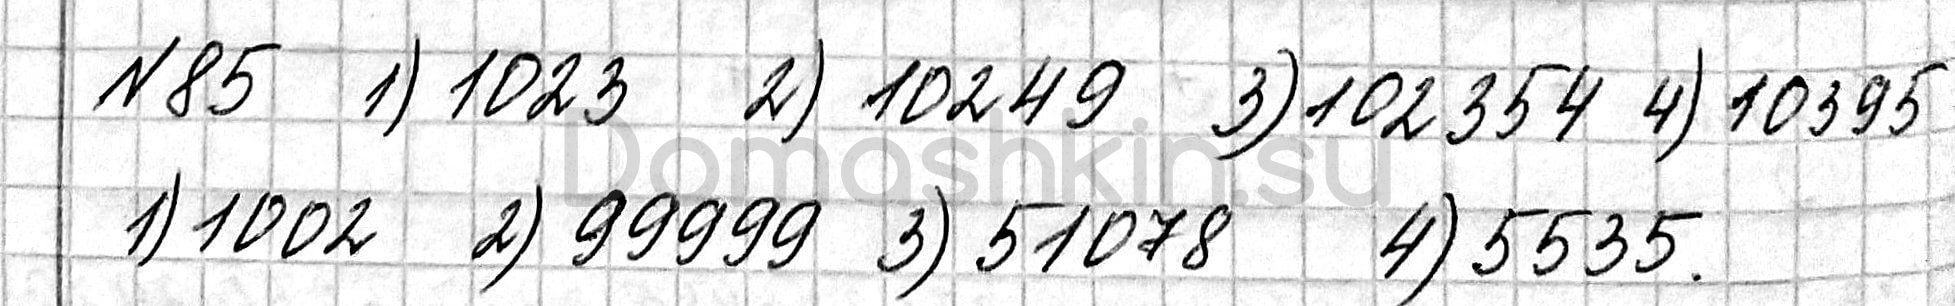 Математика 6 класс учебник Мерзляк номер 85 решение